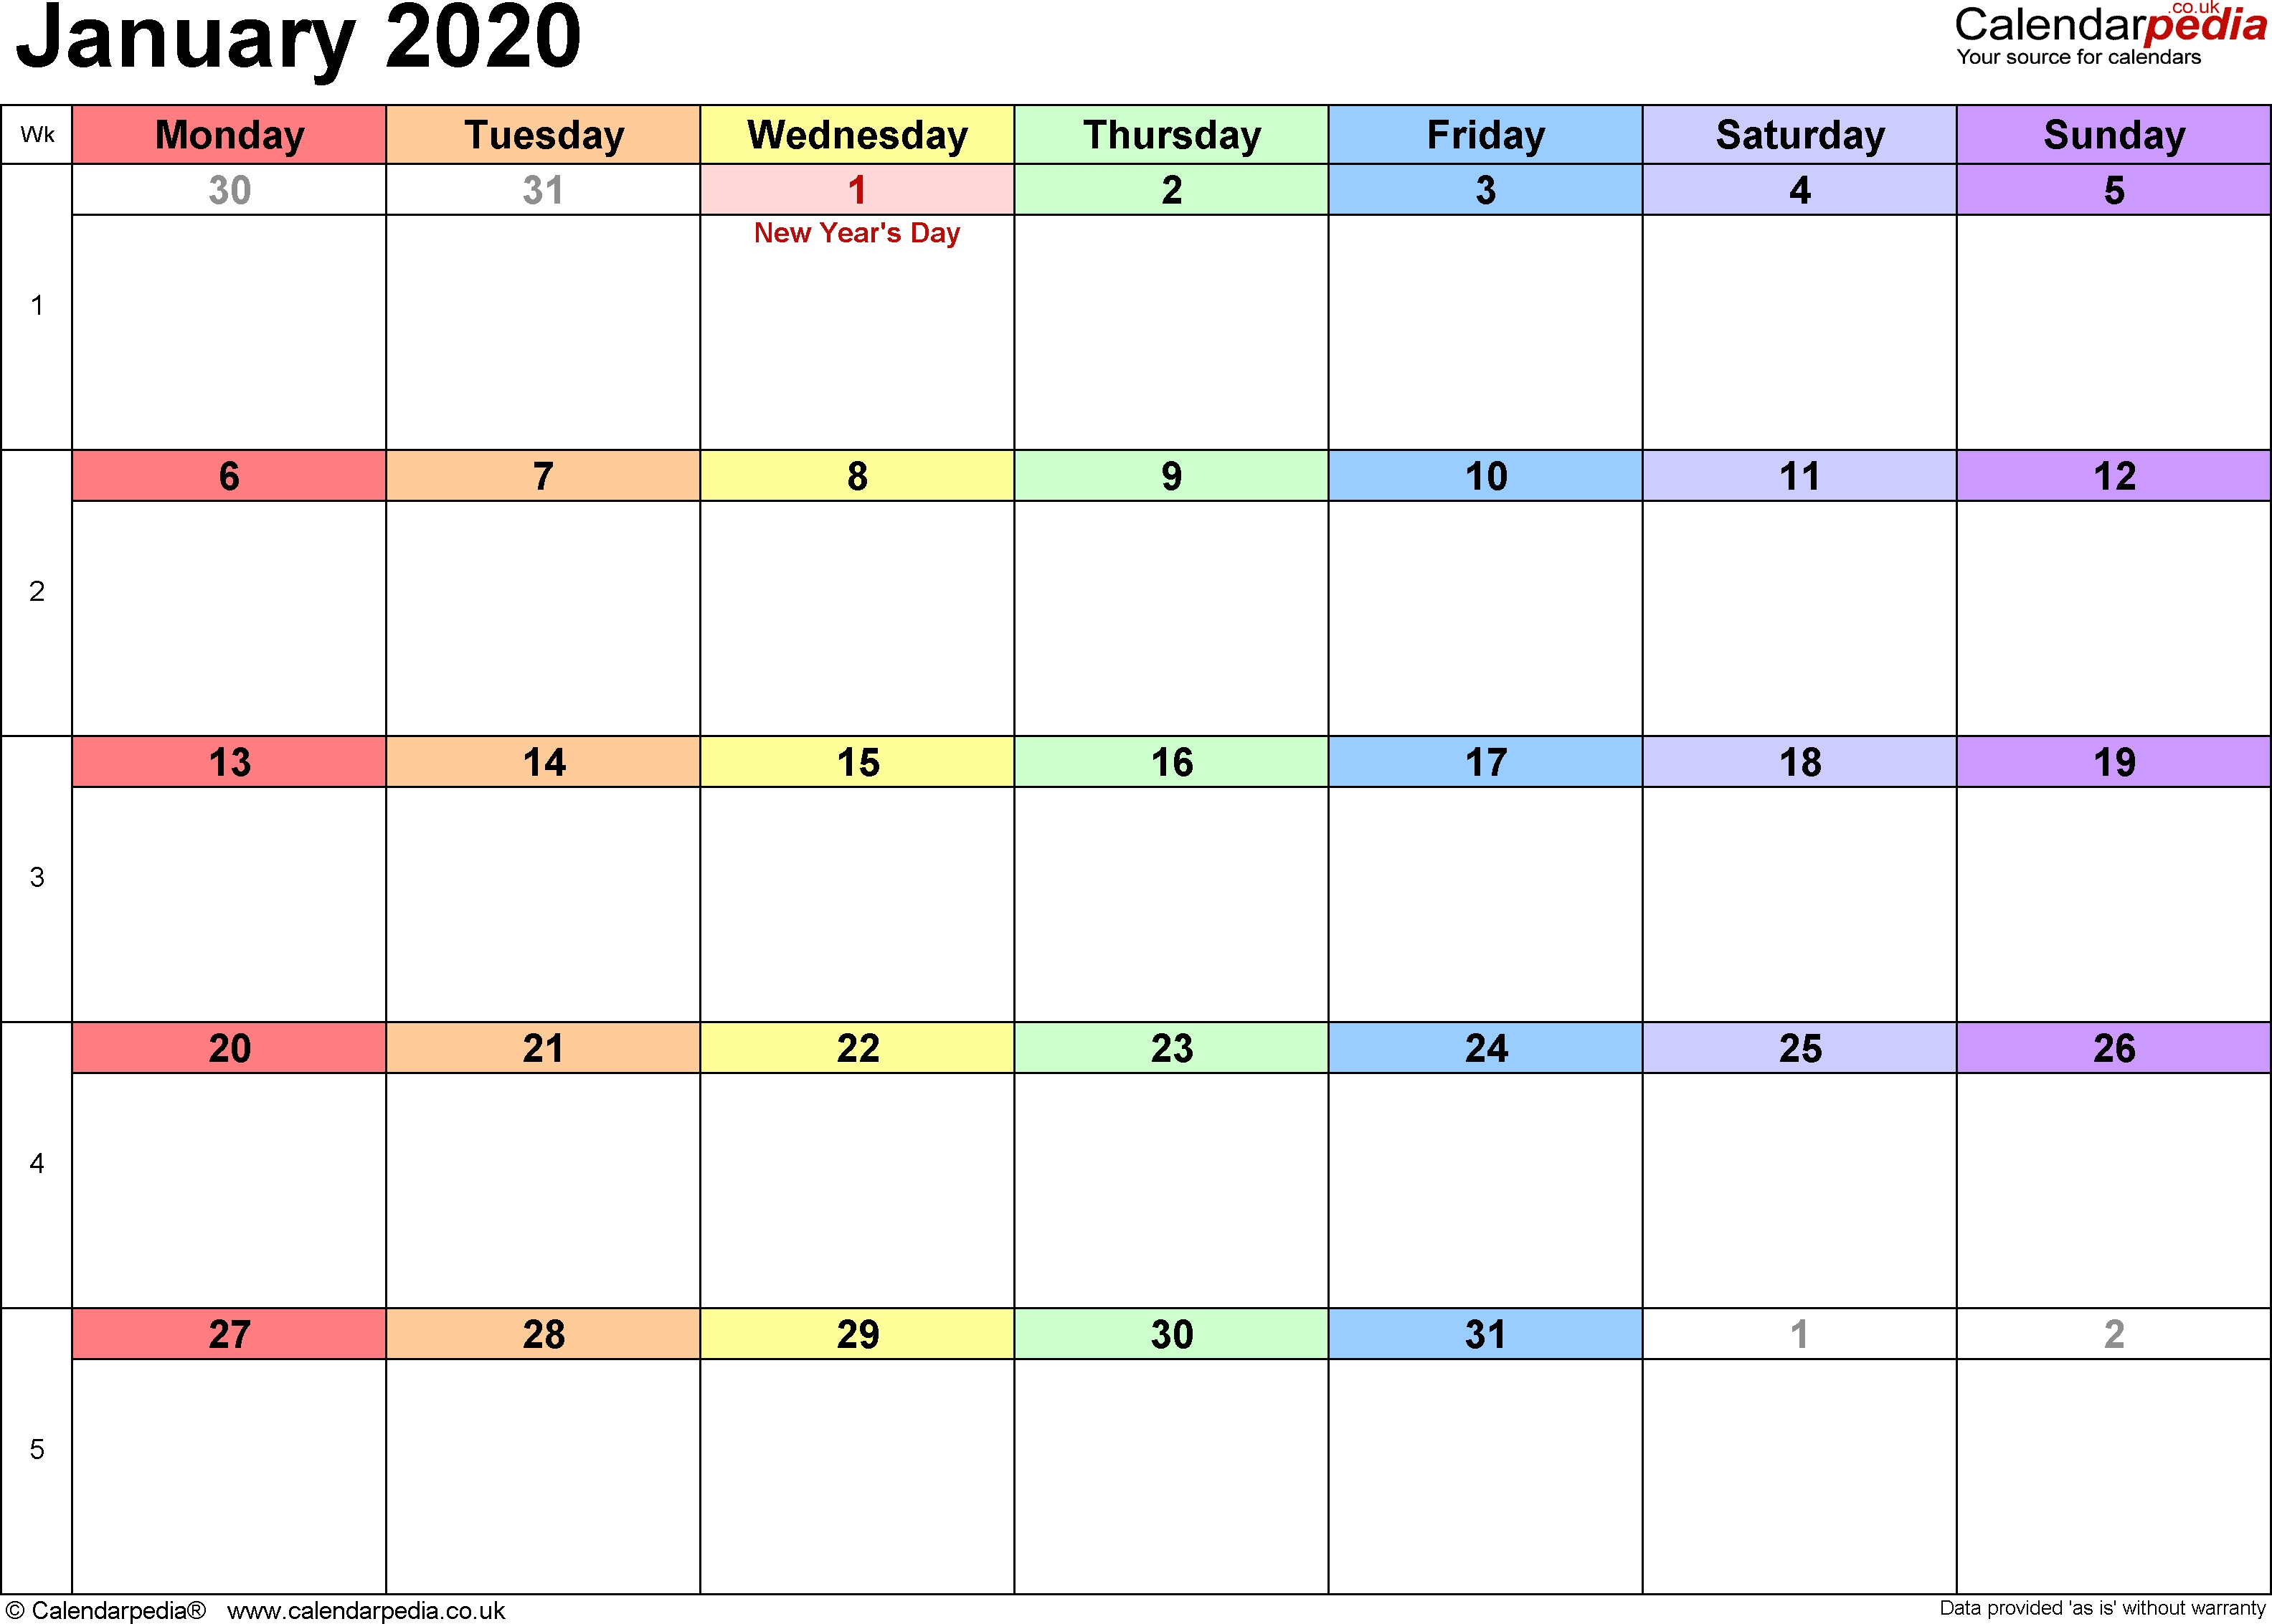 Calendar January 2020 Uk, Bank Holidays, Excel/pdf/word-January 2020 Calendar Australia